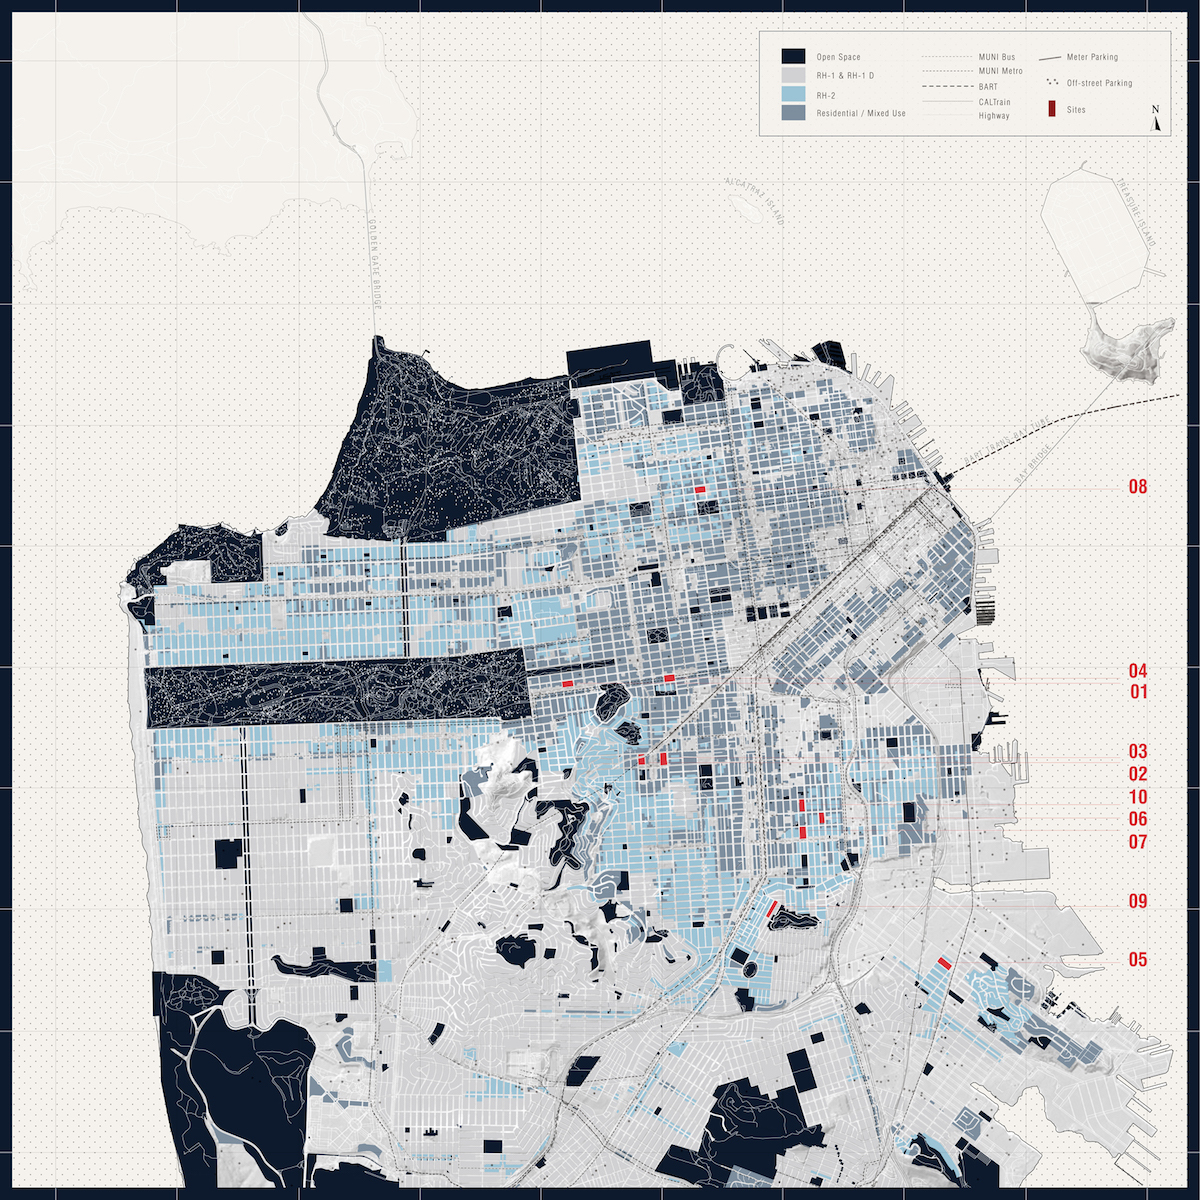 San Francisco Zoning Map